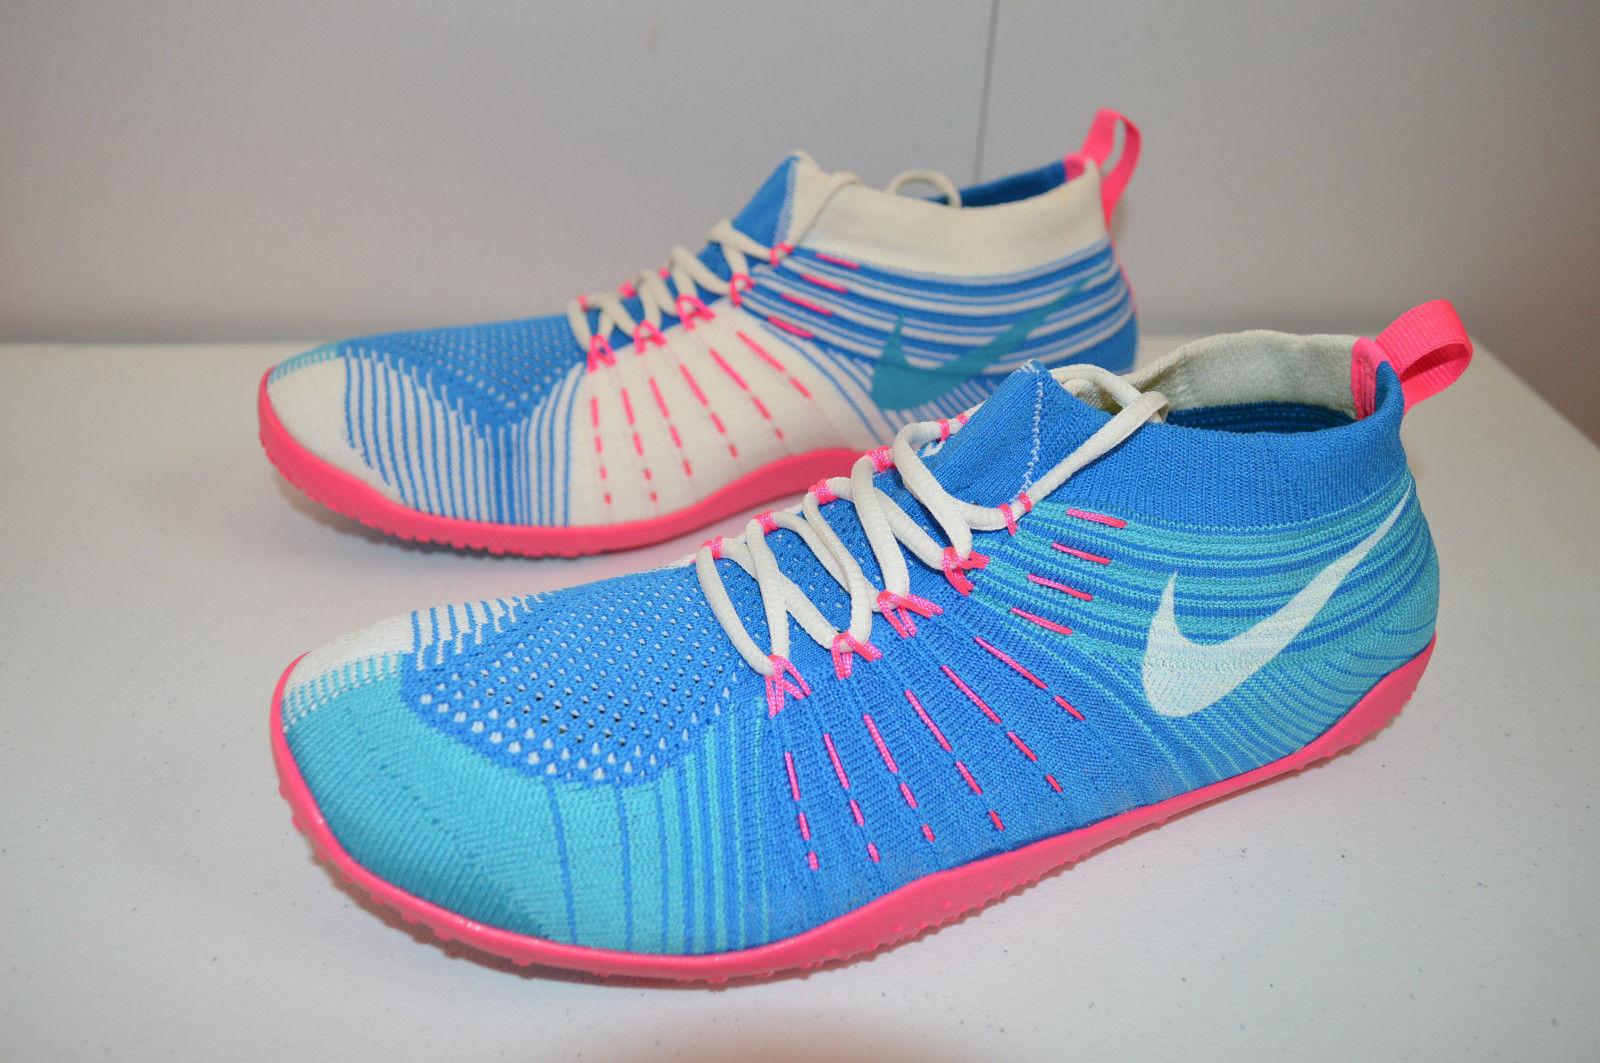 NIKE HYPERFEEL CROSS CROSS CROSS ELITE Womens 638348 400 Running shoes bluee Pink 9ca17e